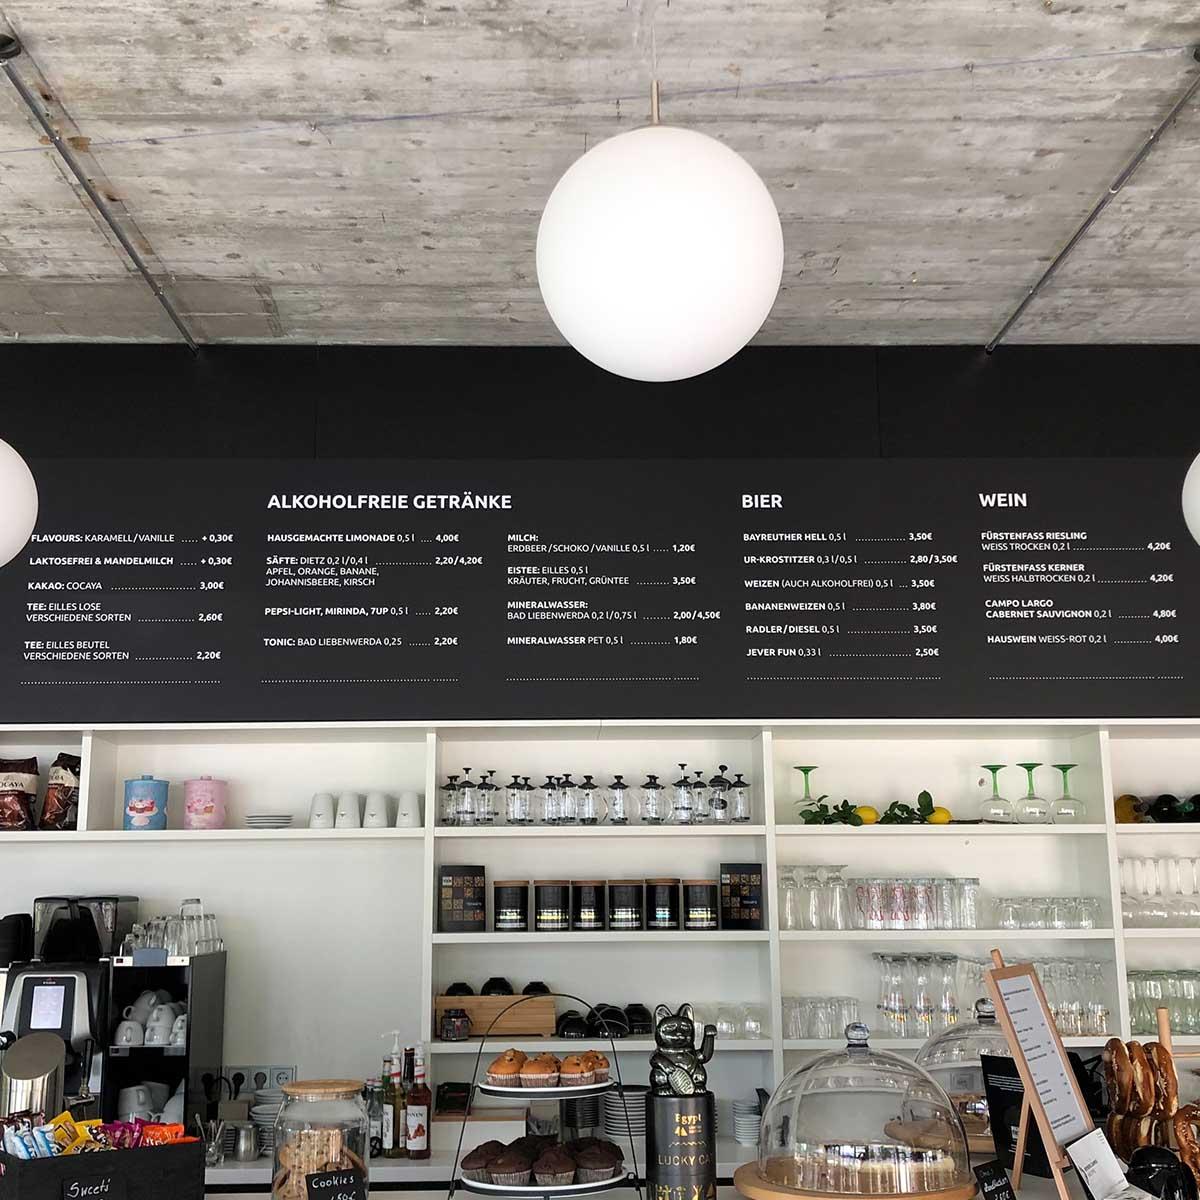 Die Bar des Hub Coffees am Weinberg Campus